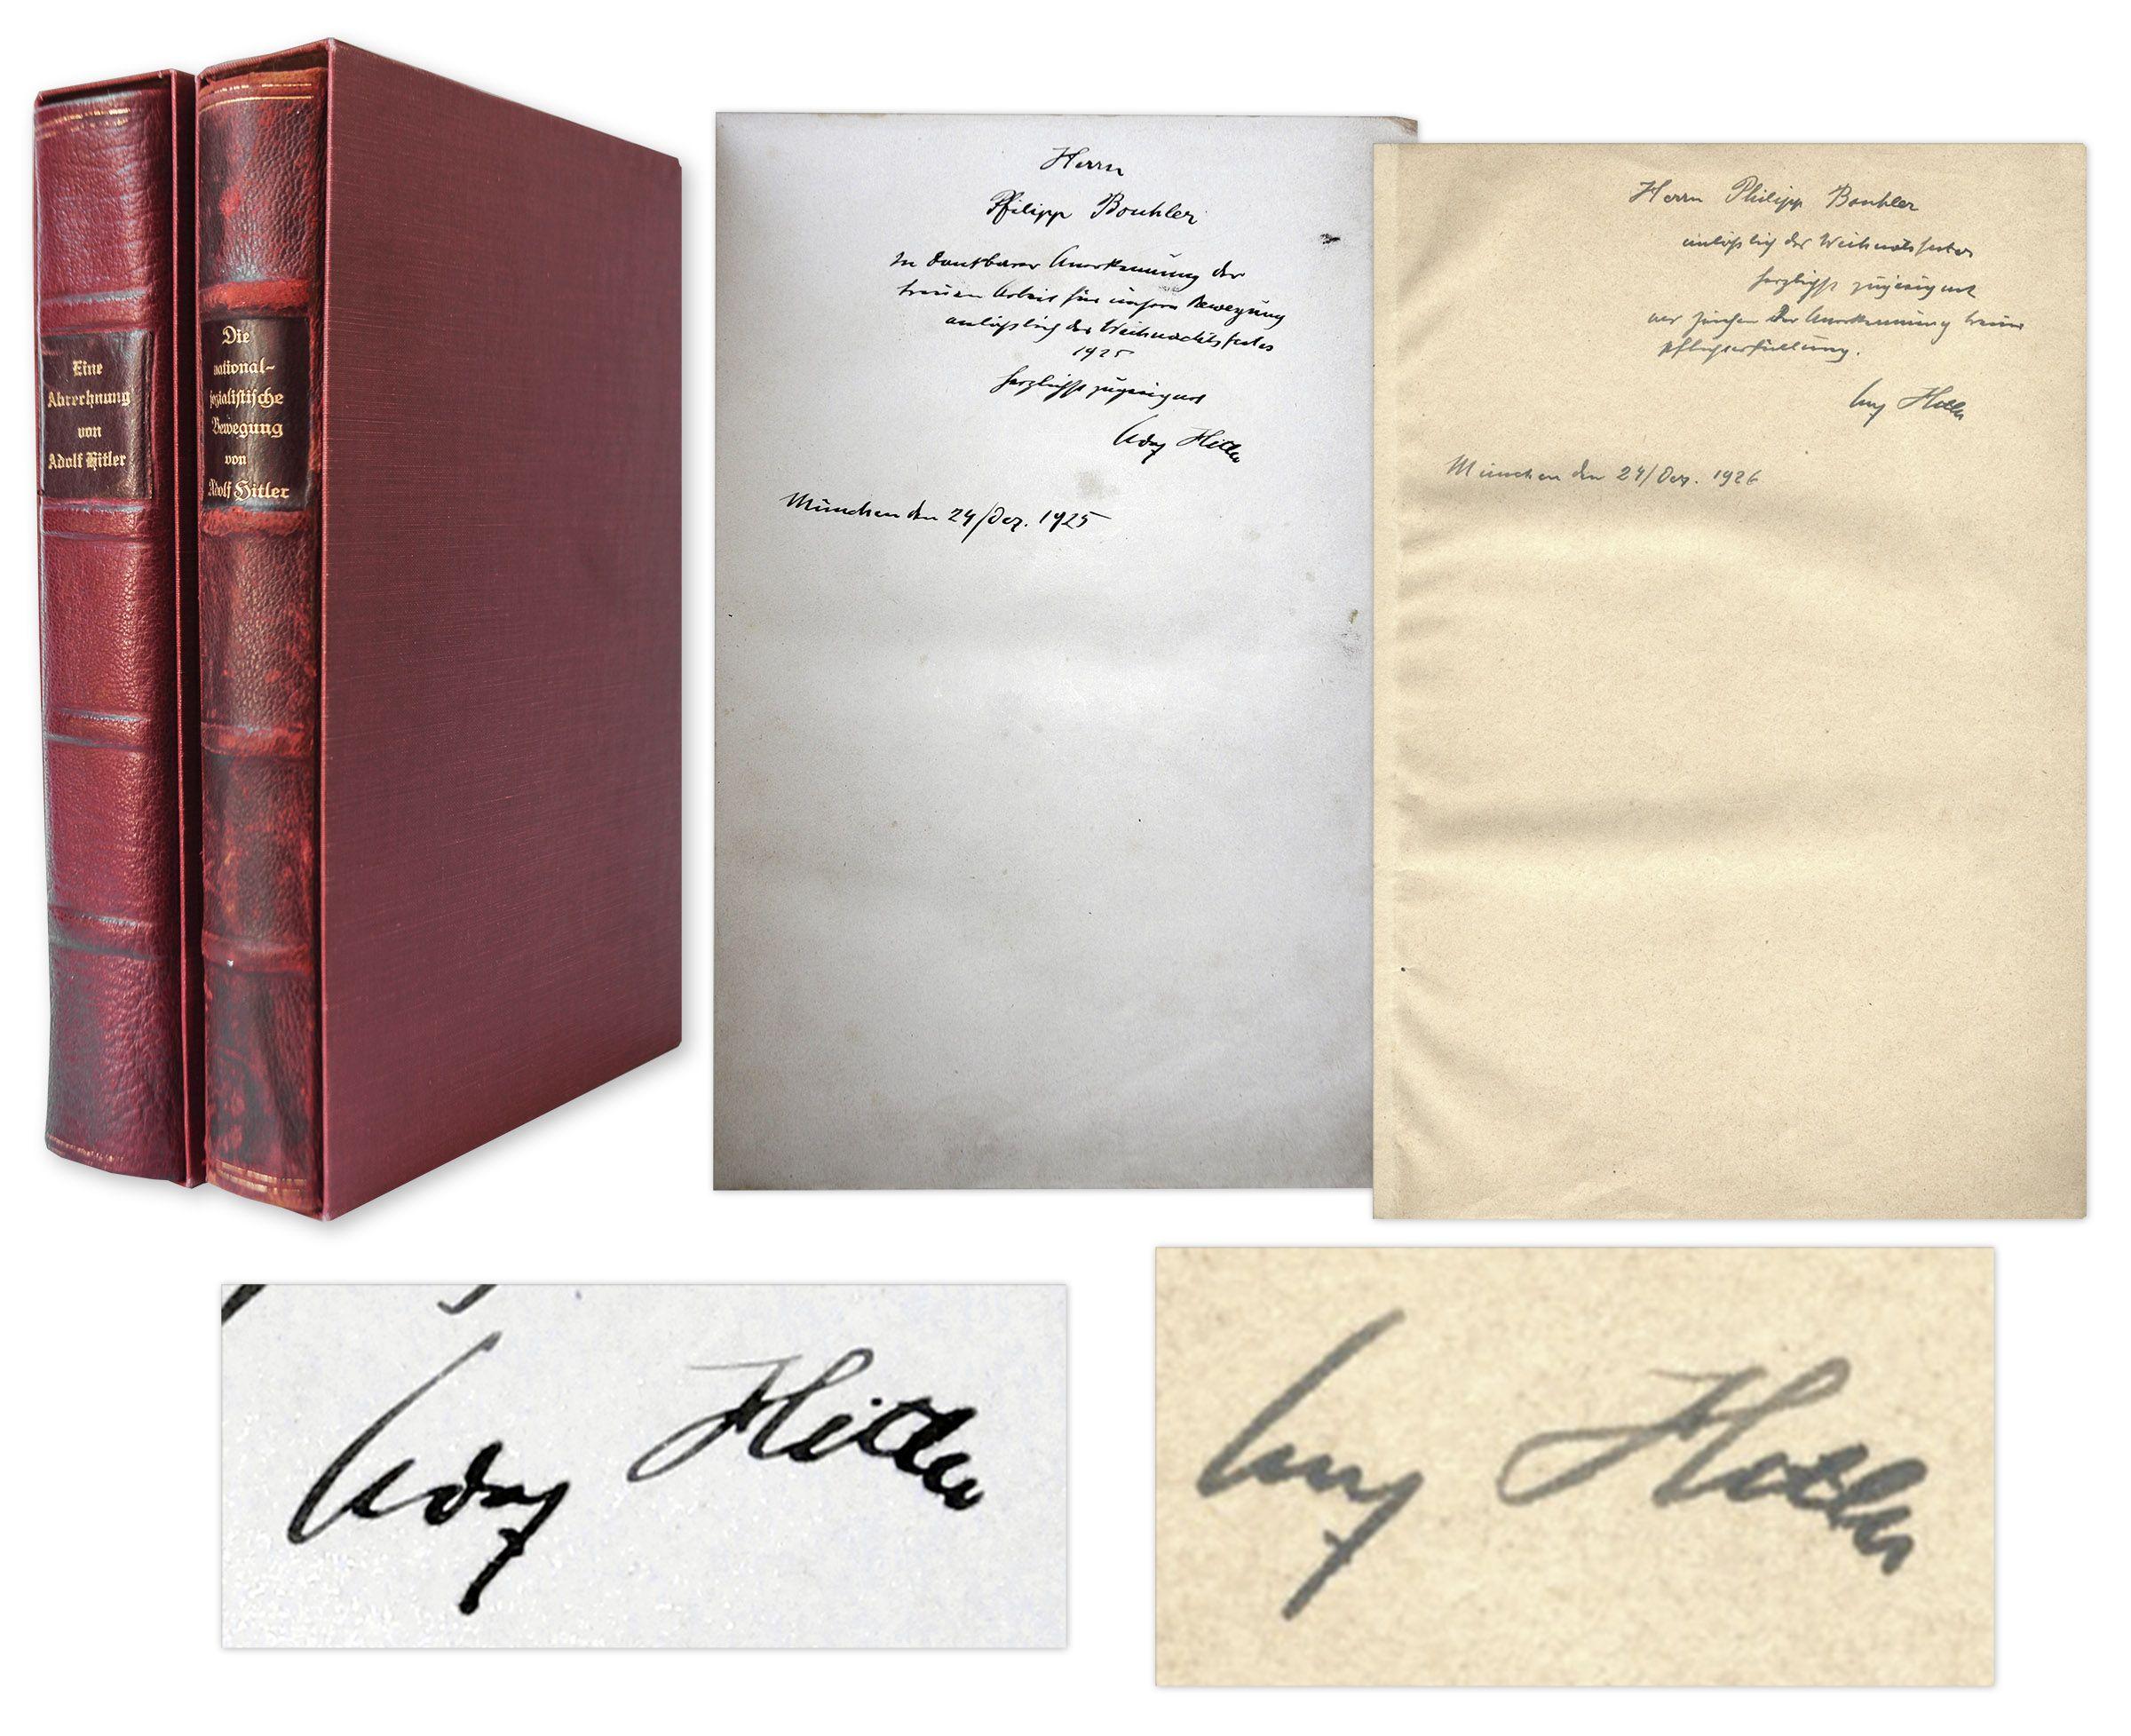 3-26-15 Hitler auction 1